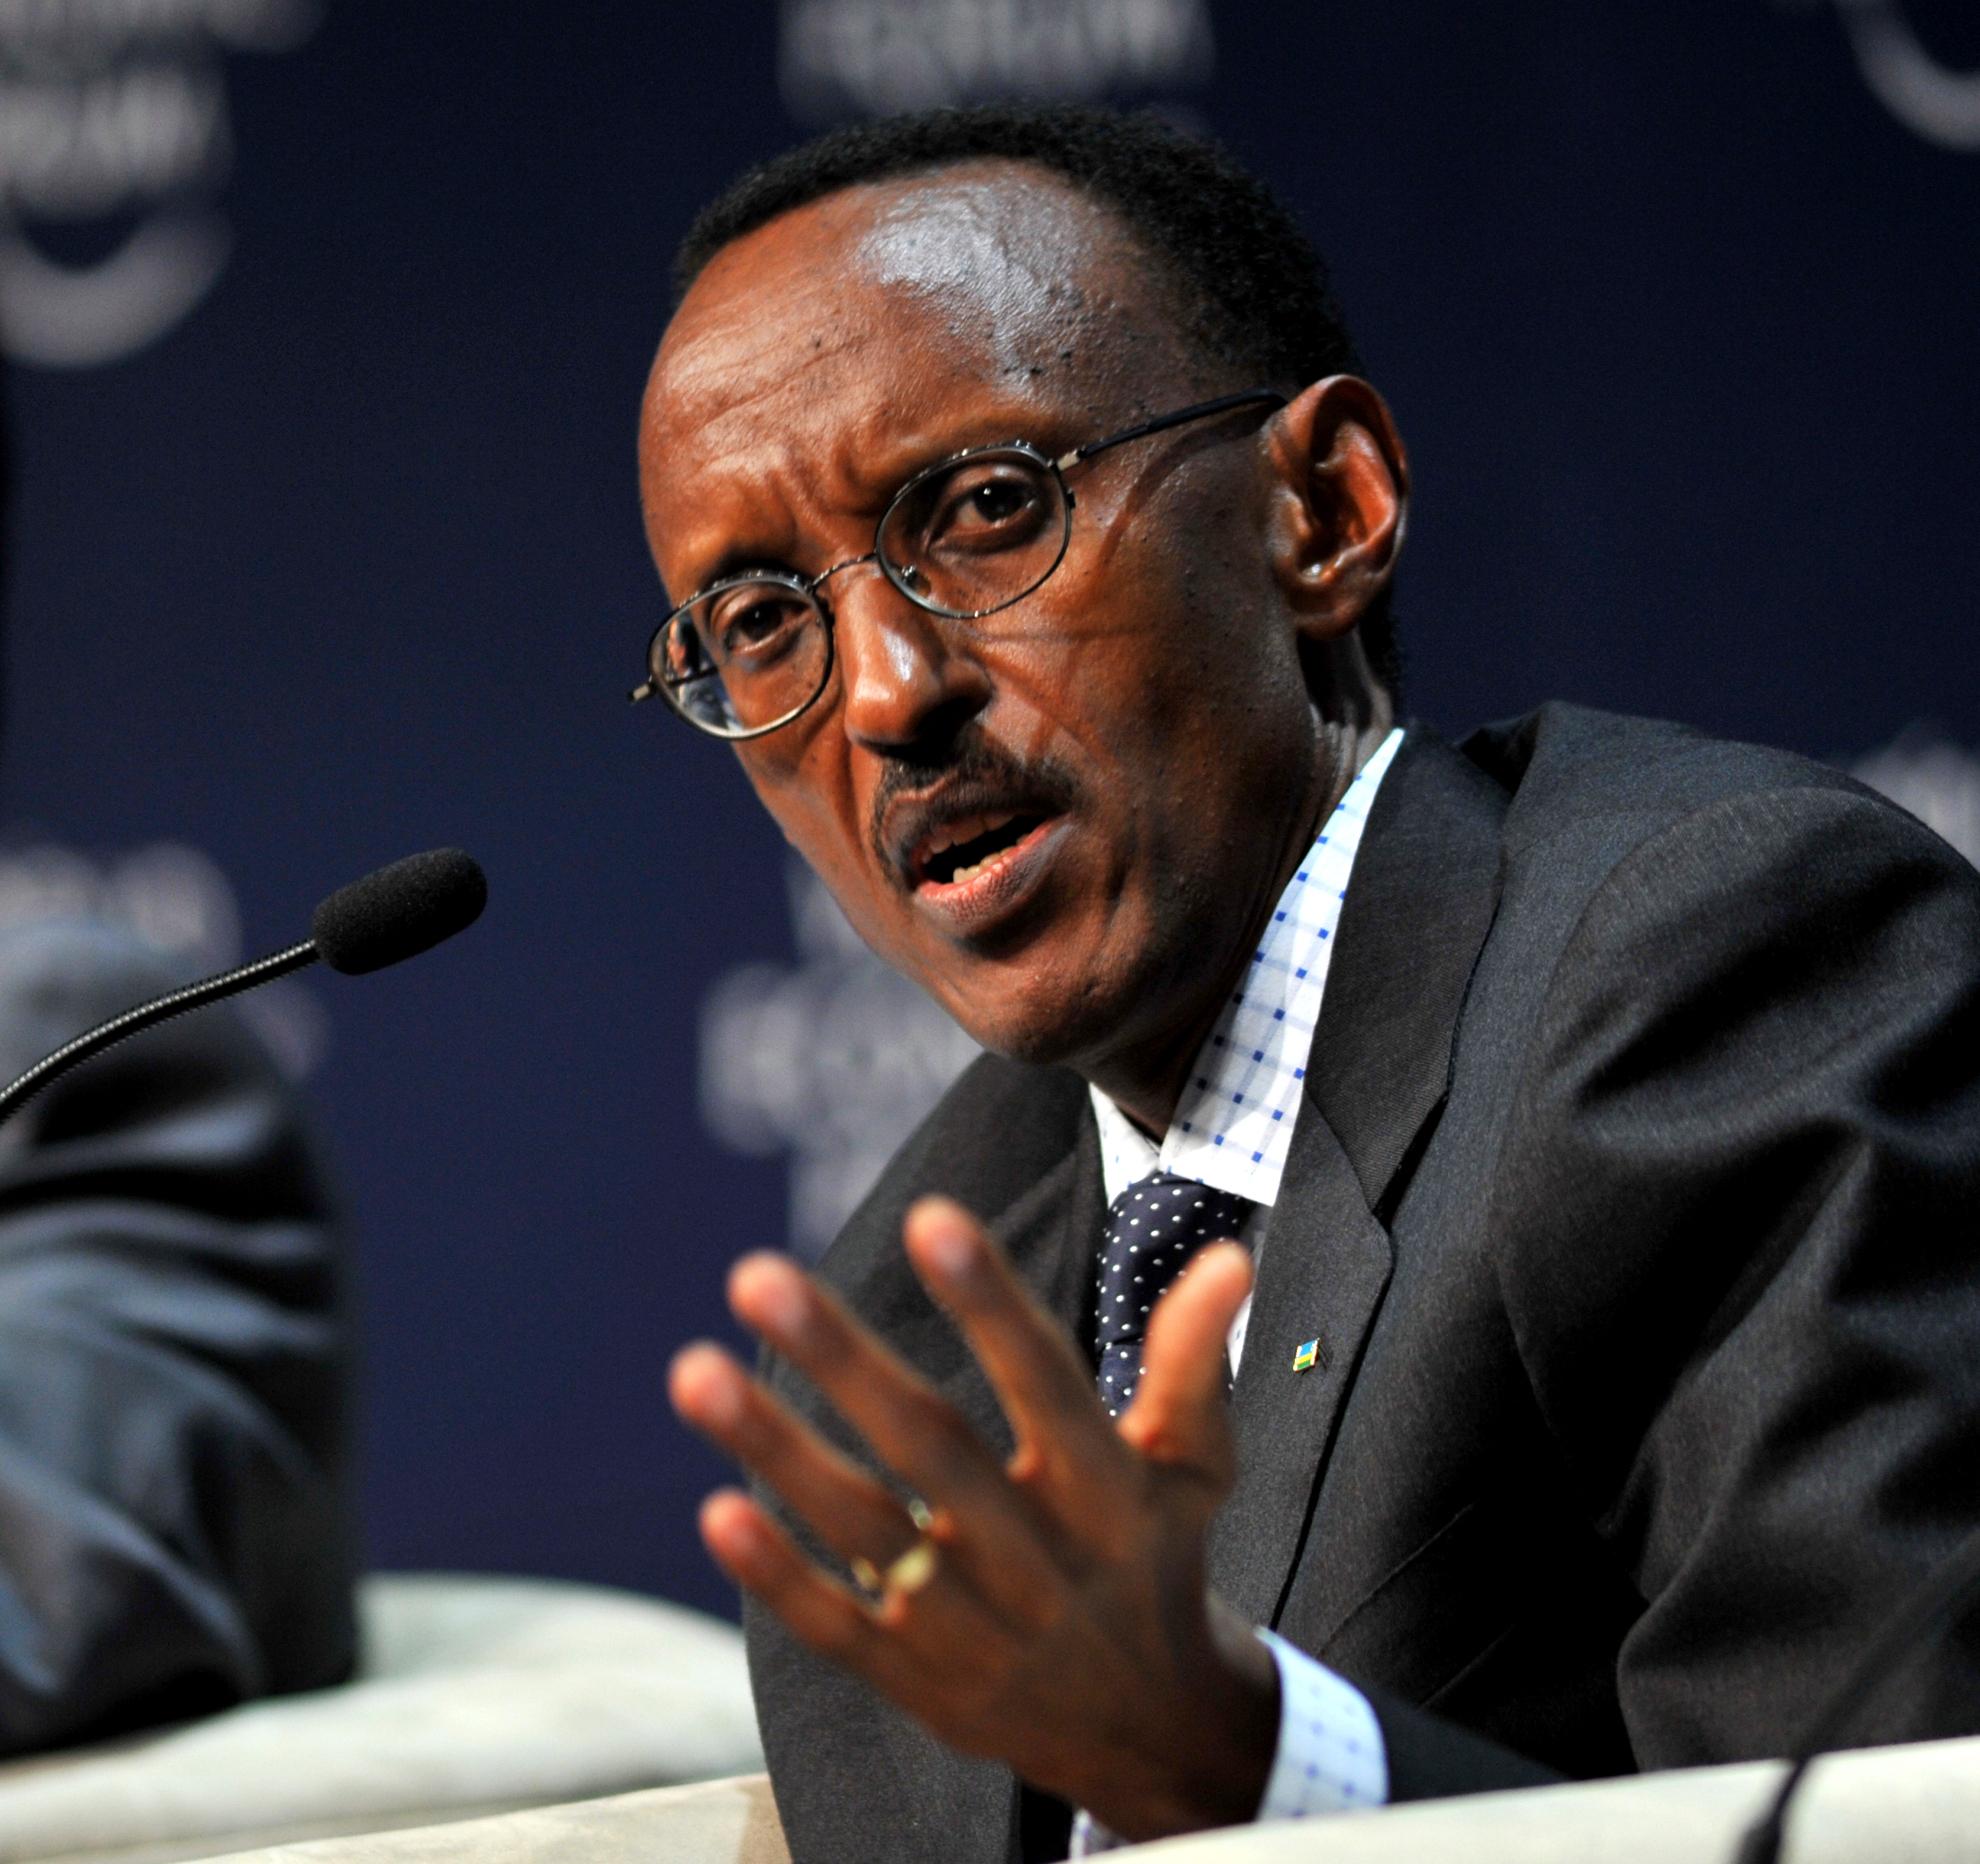 Rwanda reopens border with DR Congo amid Ebola outbreak